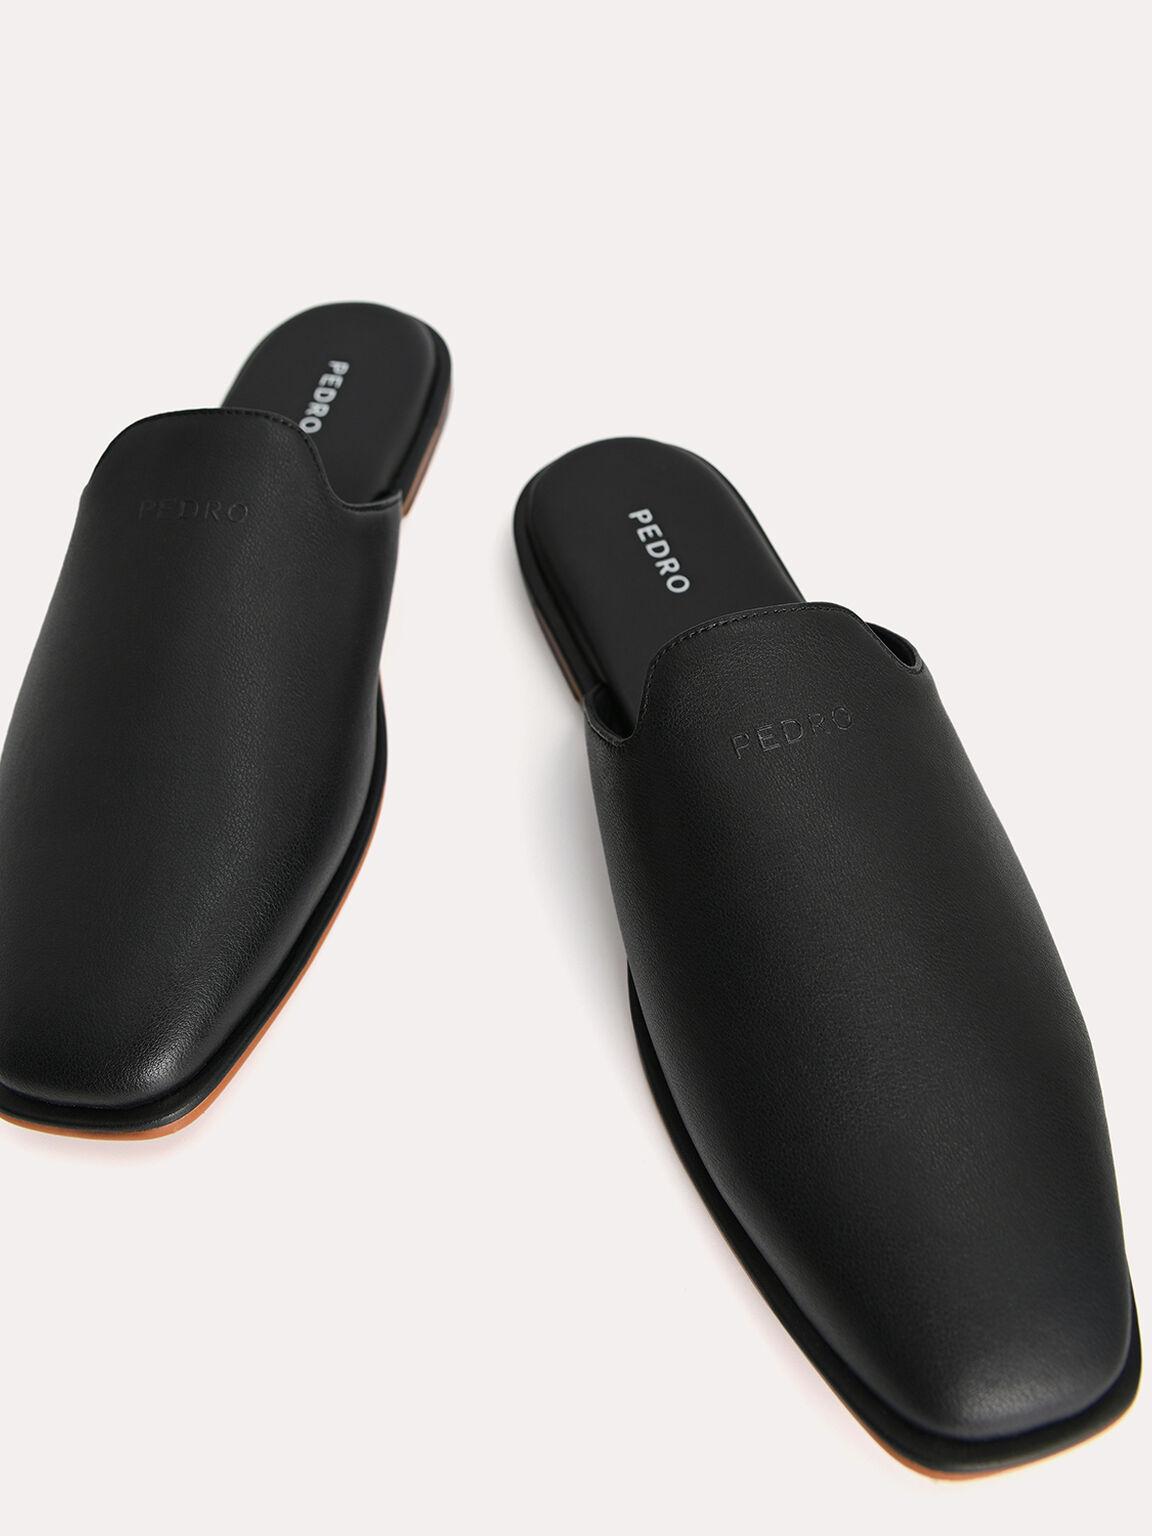 Slip-On Leather Mules, Black, hi-res